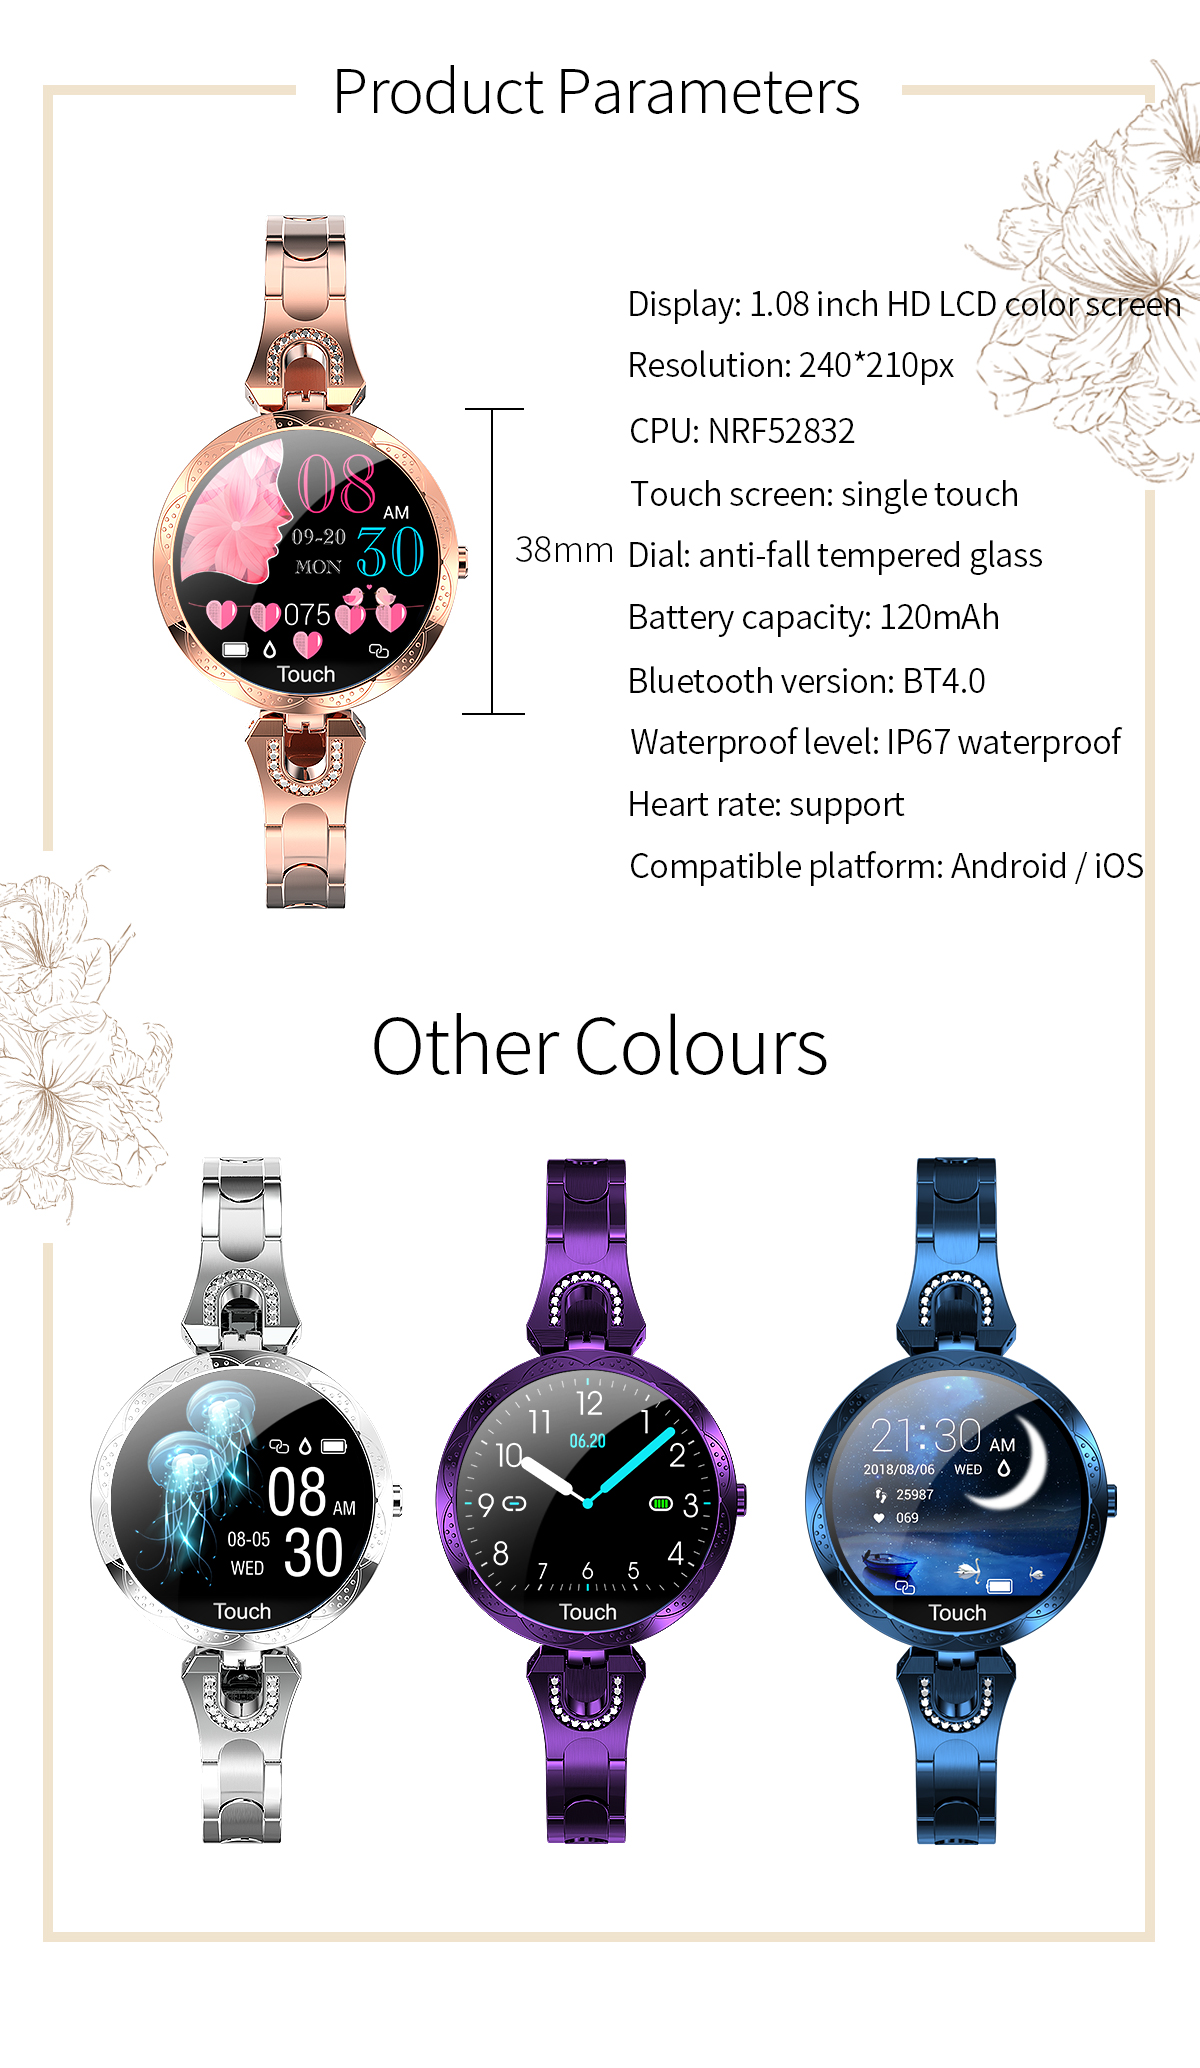 Hdf7bbf1dd7674ee3a4ef625d30920a56M COBRAFLY AK15 Smart Watch Women Bracelet Heart Rate Monitoring IP67 Waterproof Fitness Tracker Ladies Watches for Xiaomi Iphone